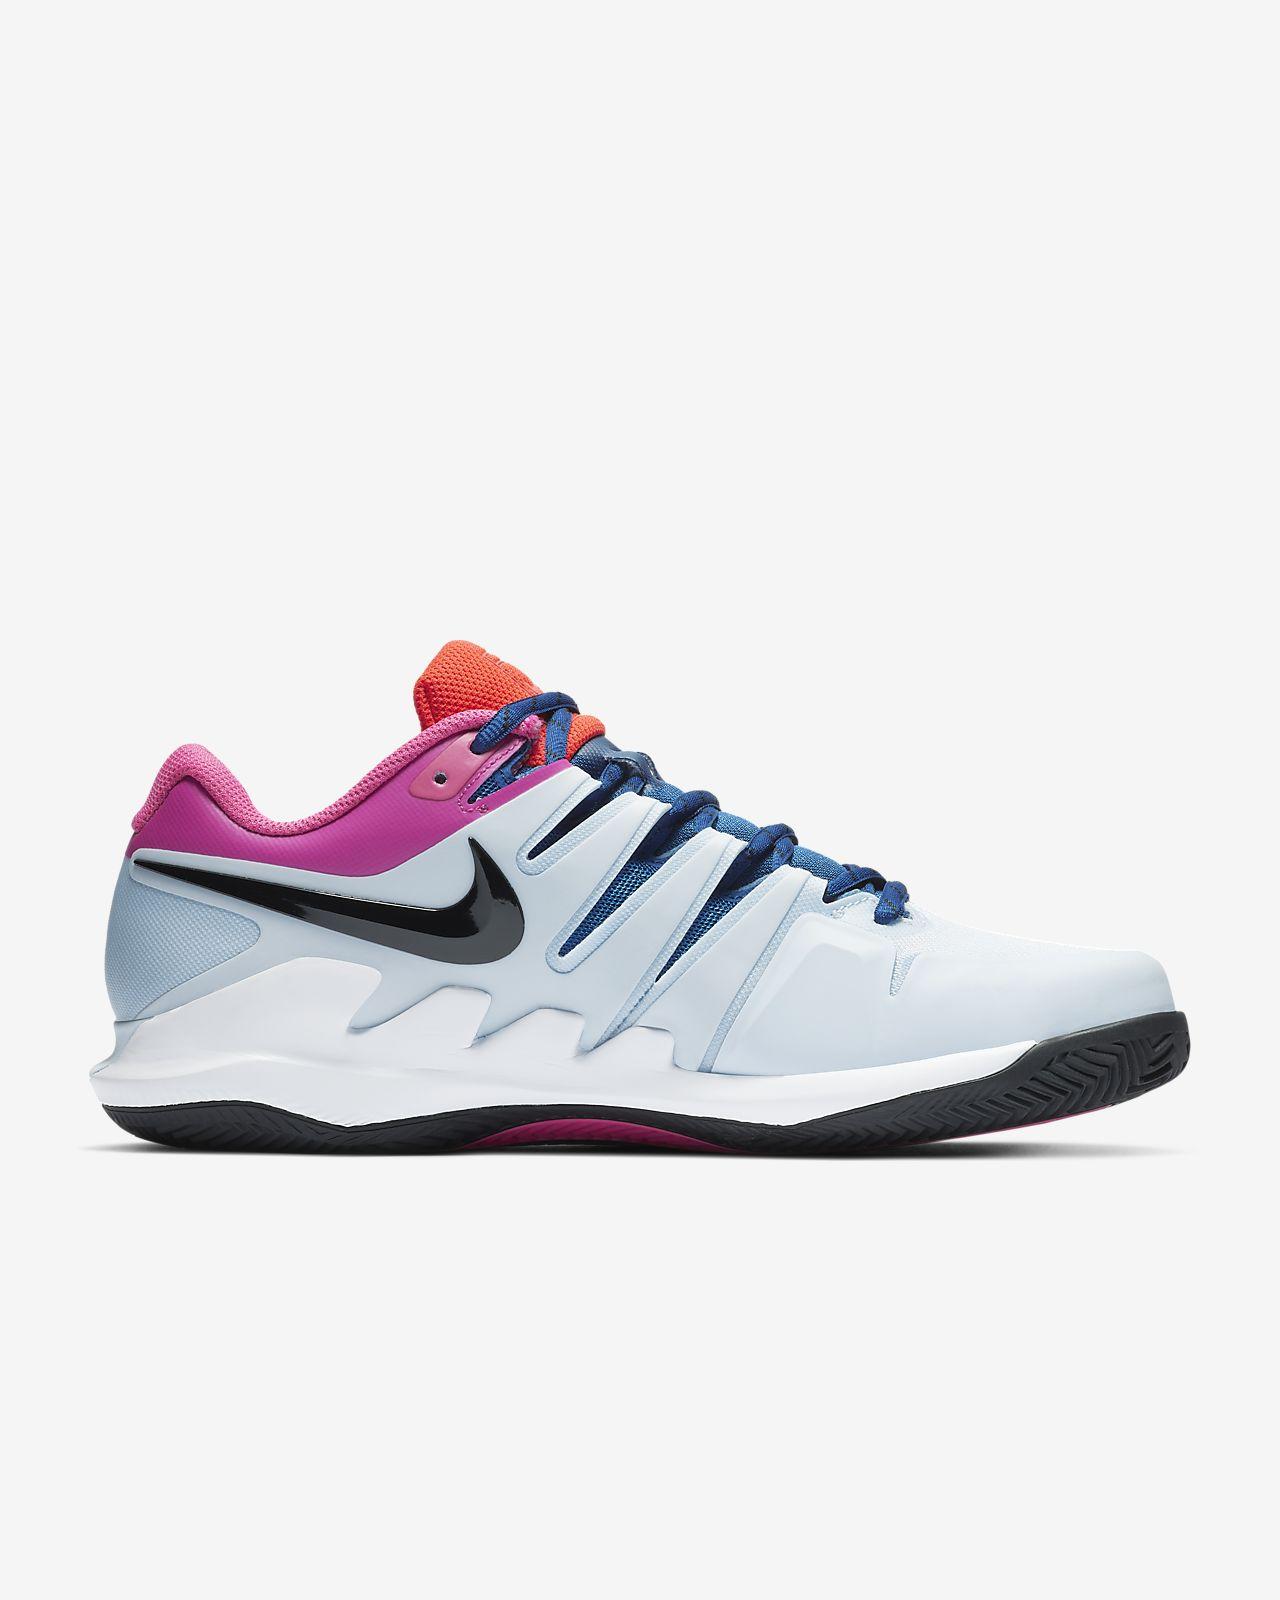 brand new 9c2c6 20090 ... Chaussure de tennis Nike Air Zoom Vapor X Clay pour Homme